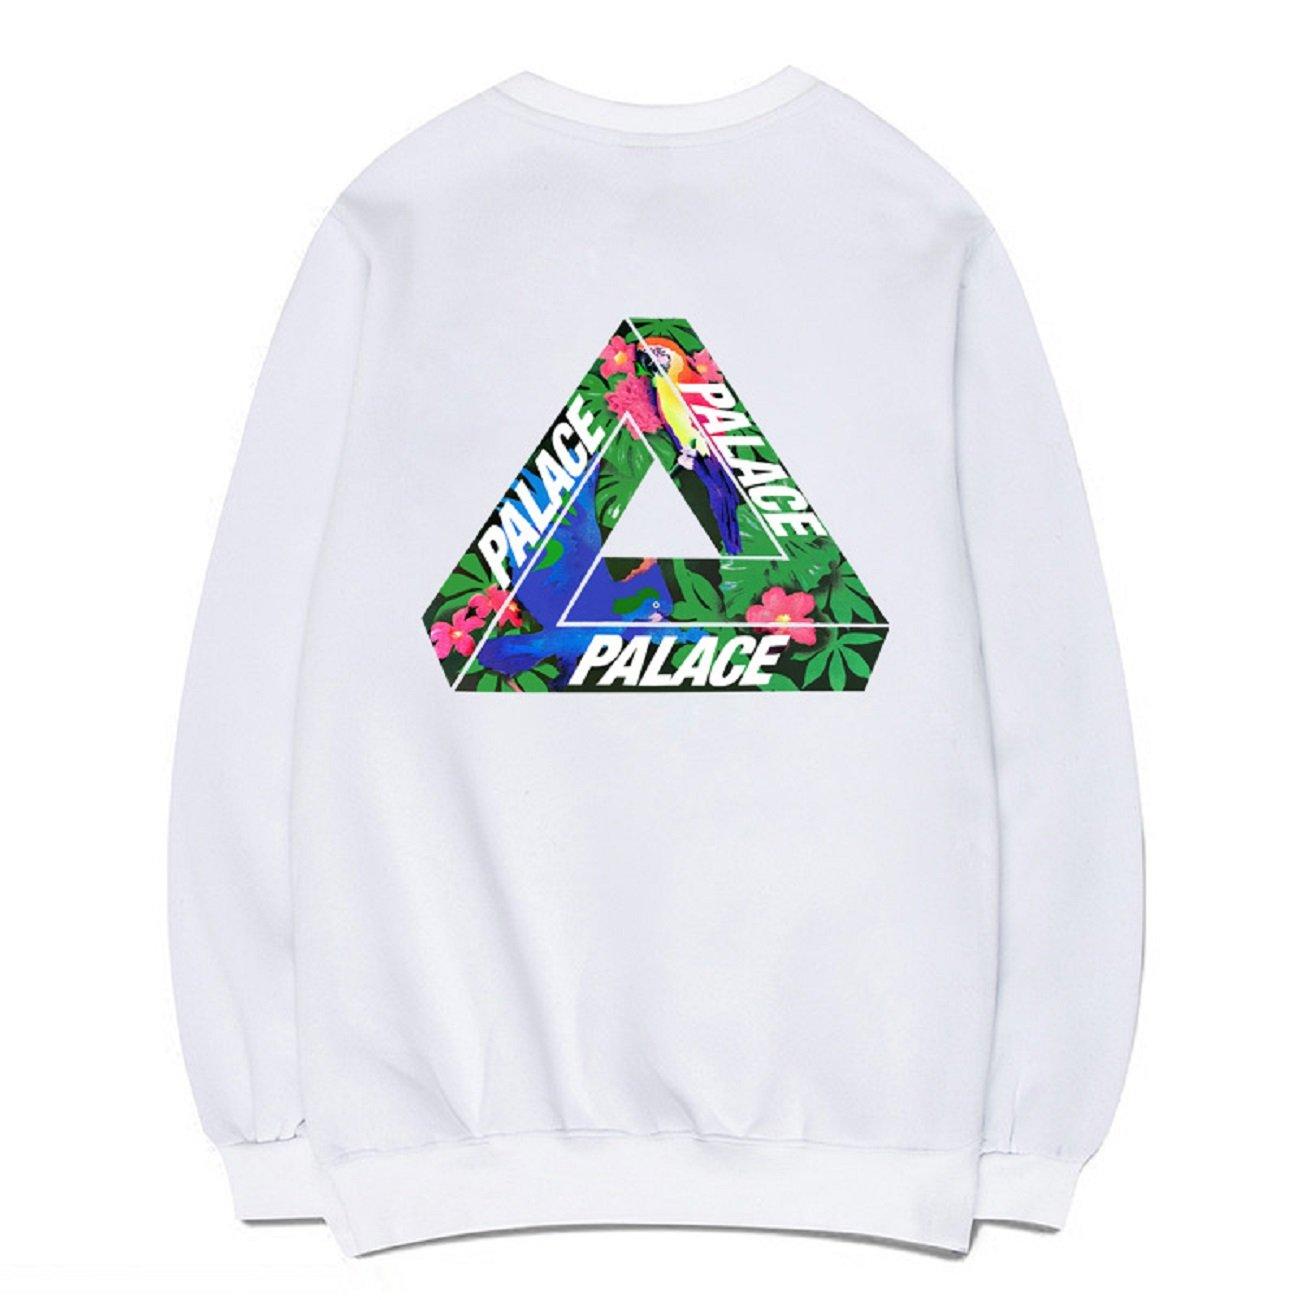 550543061655 CORIRESHA Fashion Floral Triangle Print Long Sleeve Fleece Sweatshirt at  Amazon Women s Clothing store